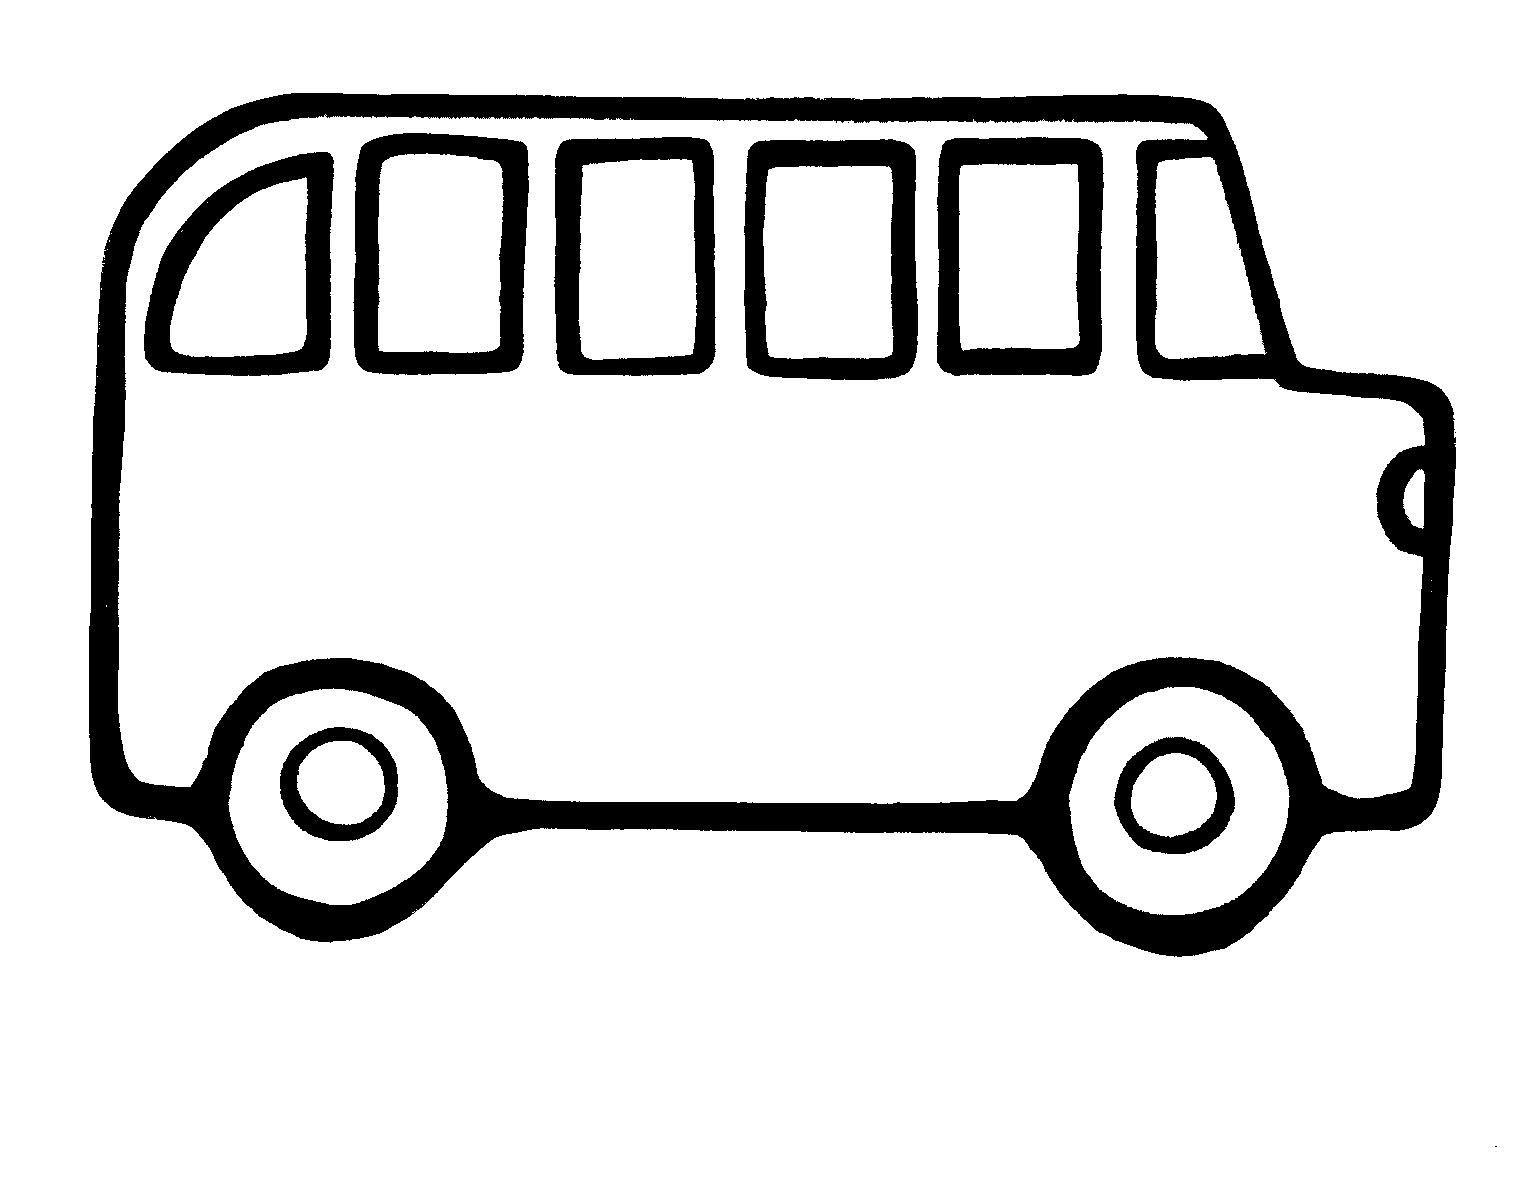 School Bus Outline Template School Bus Coloring Page Bus Coloring Page Bus Coloring Pages